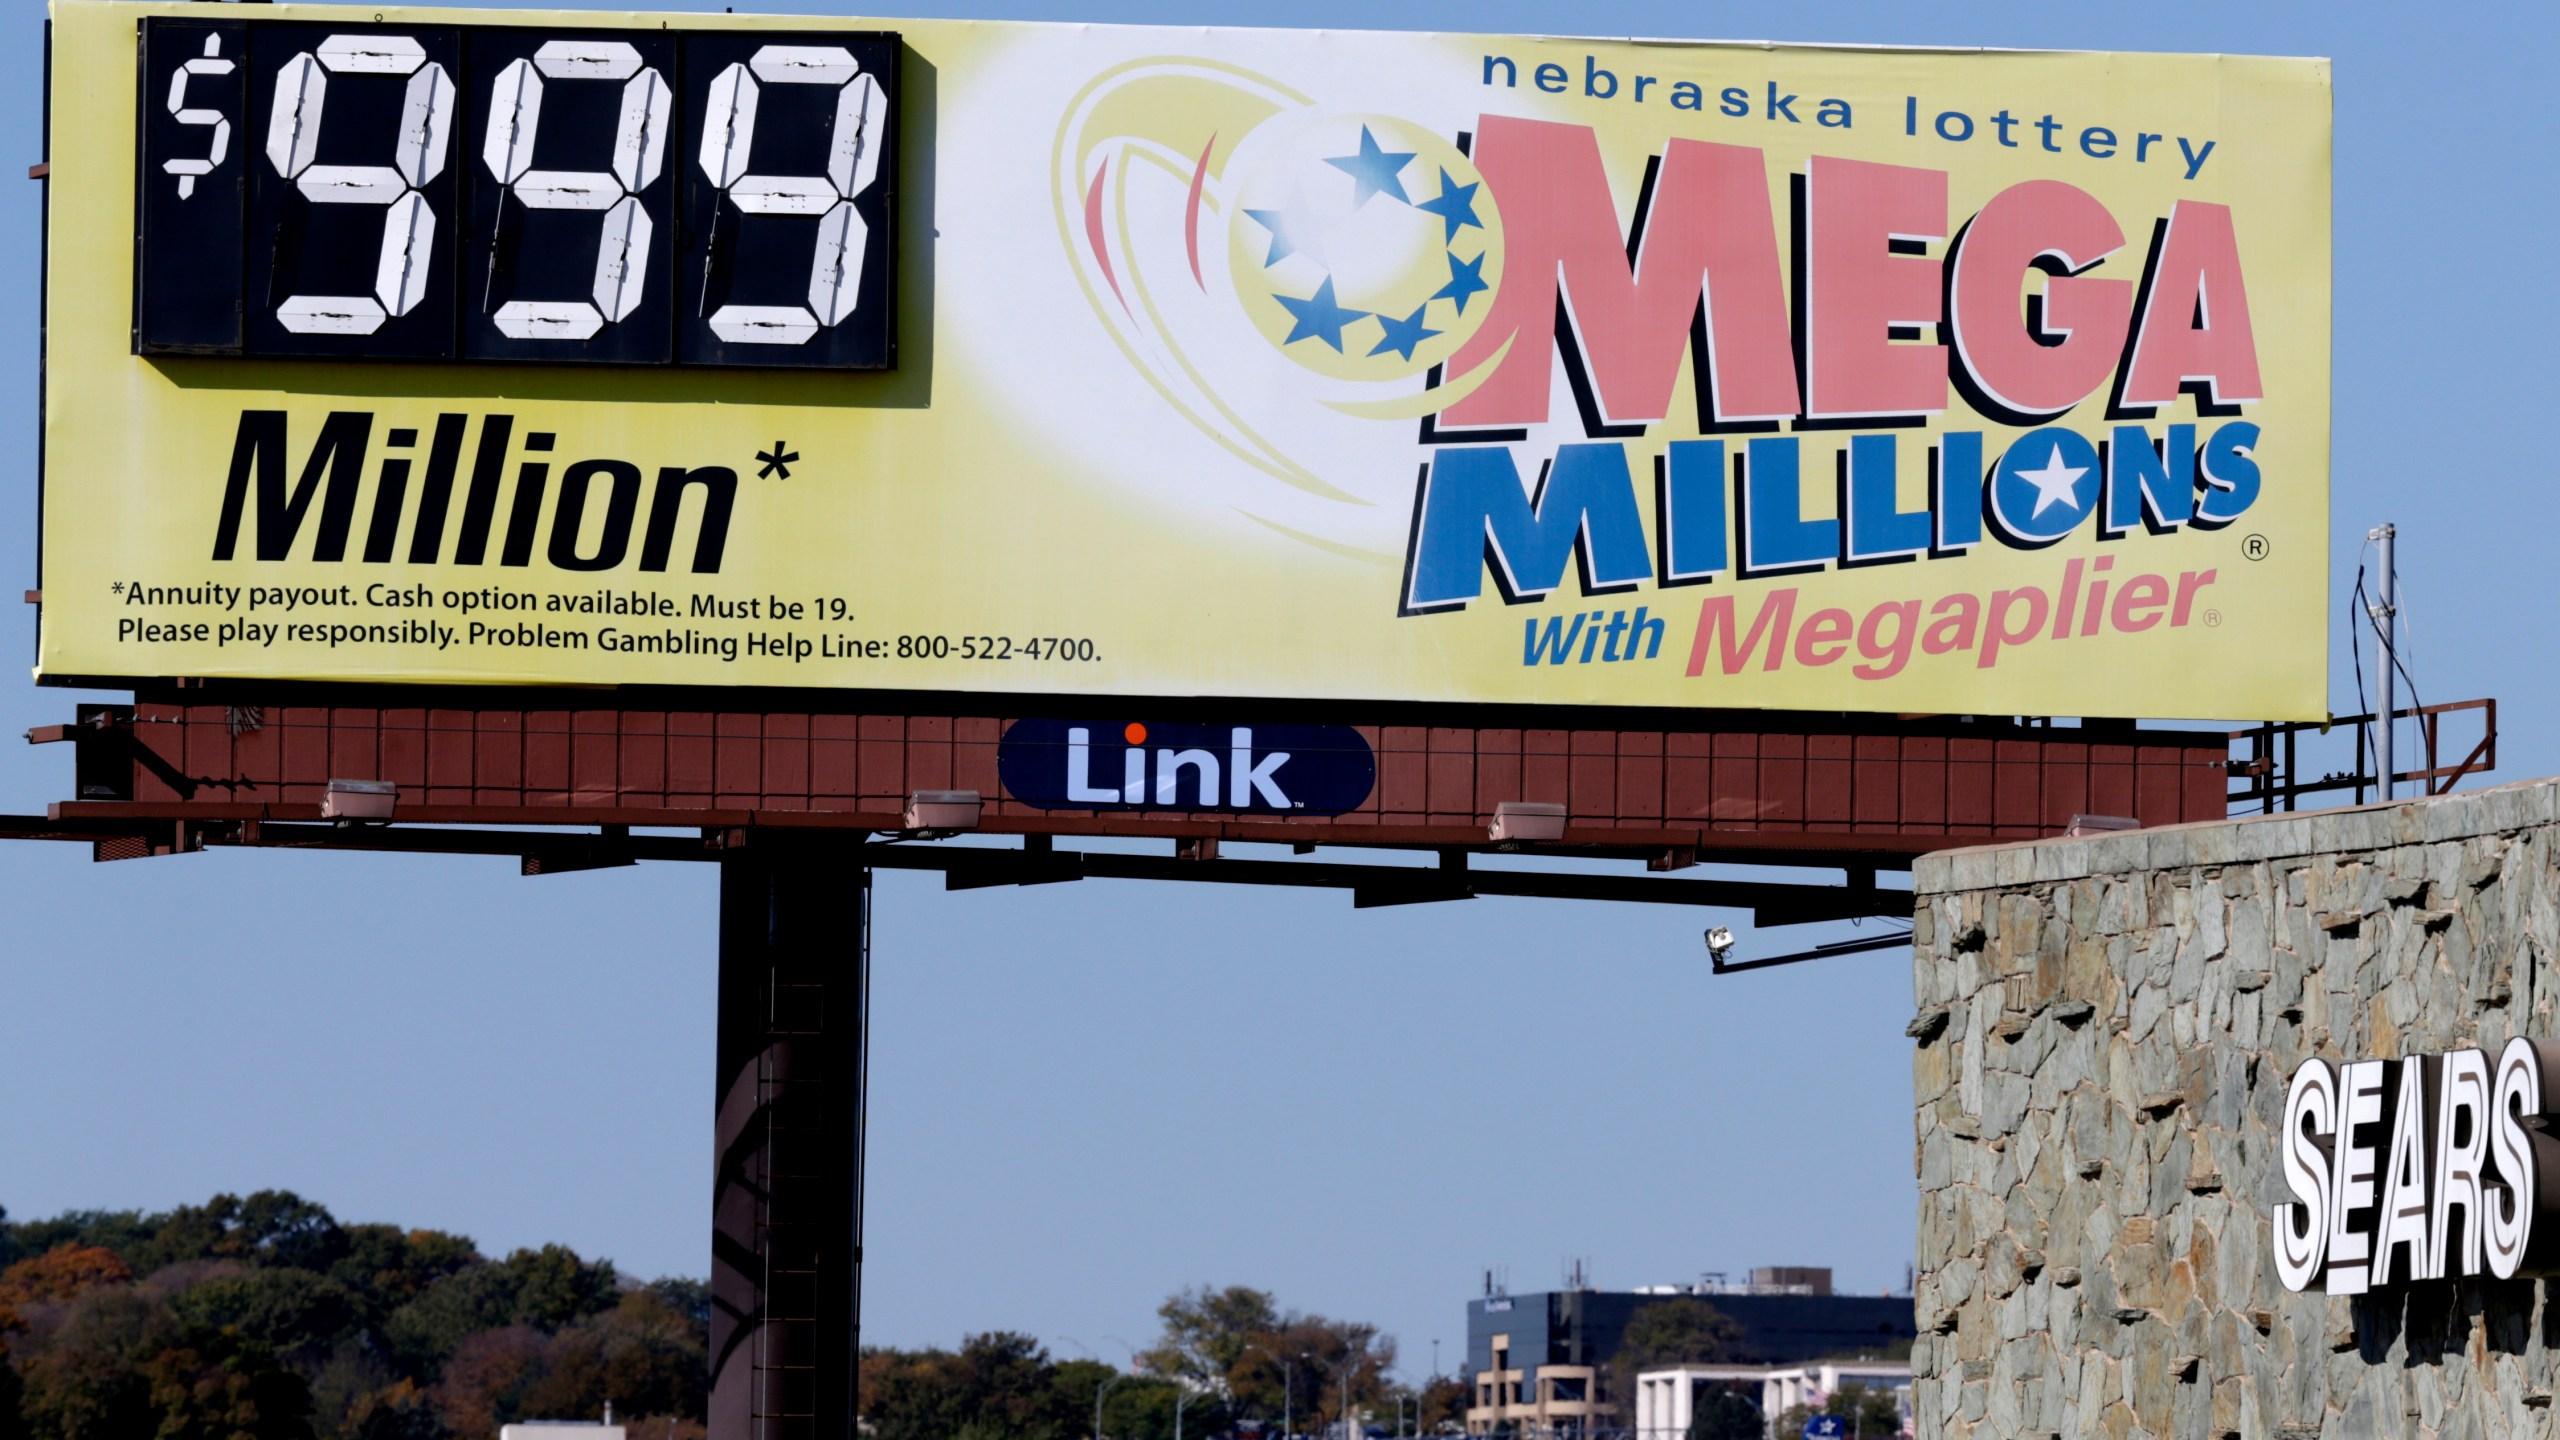 Powerball and Mega Millions combined jackpot hits $2 billion